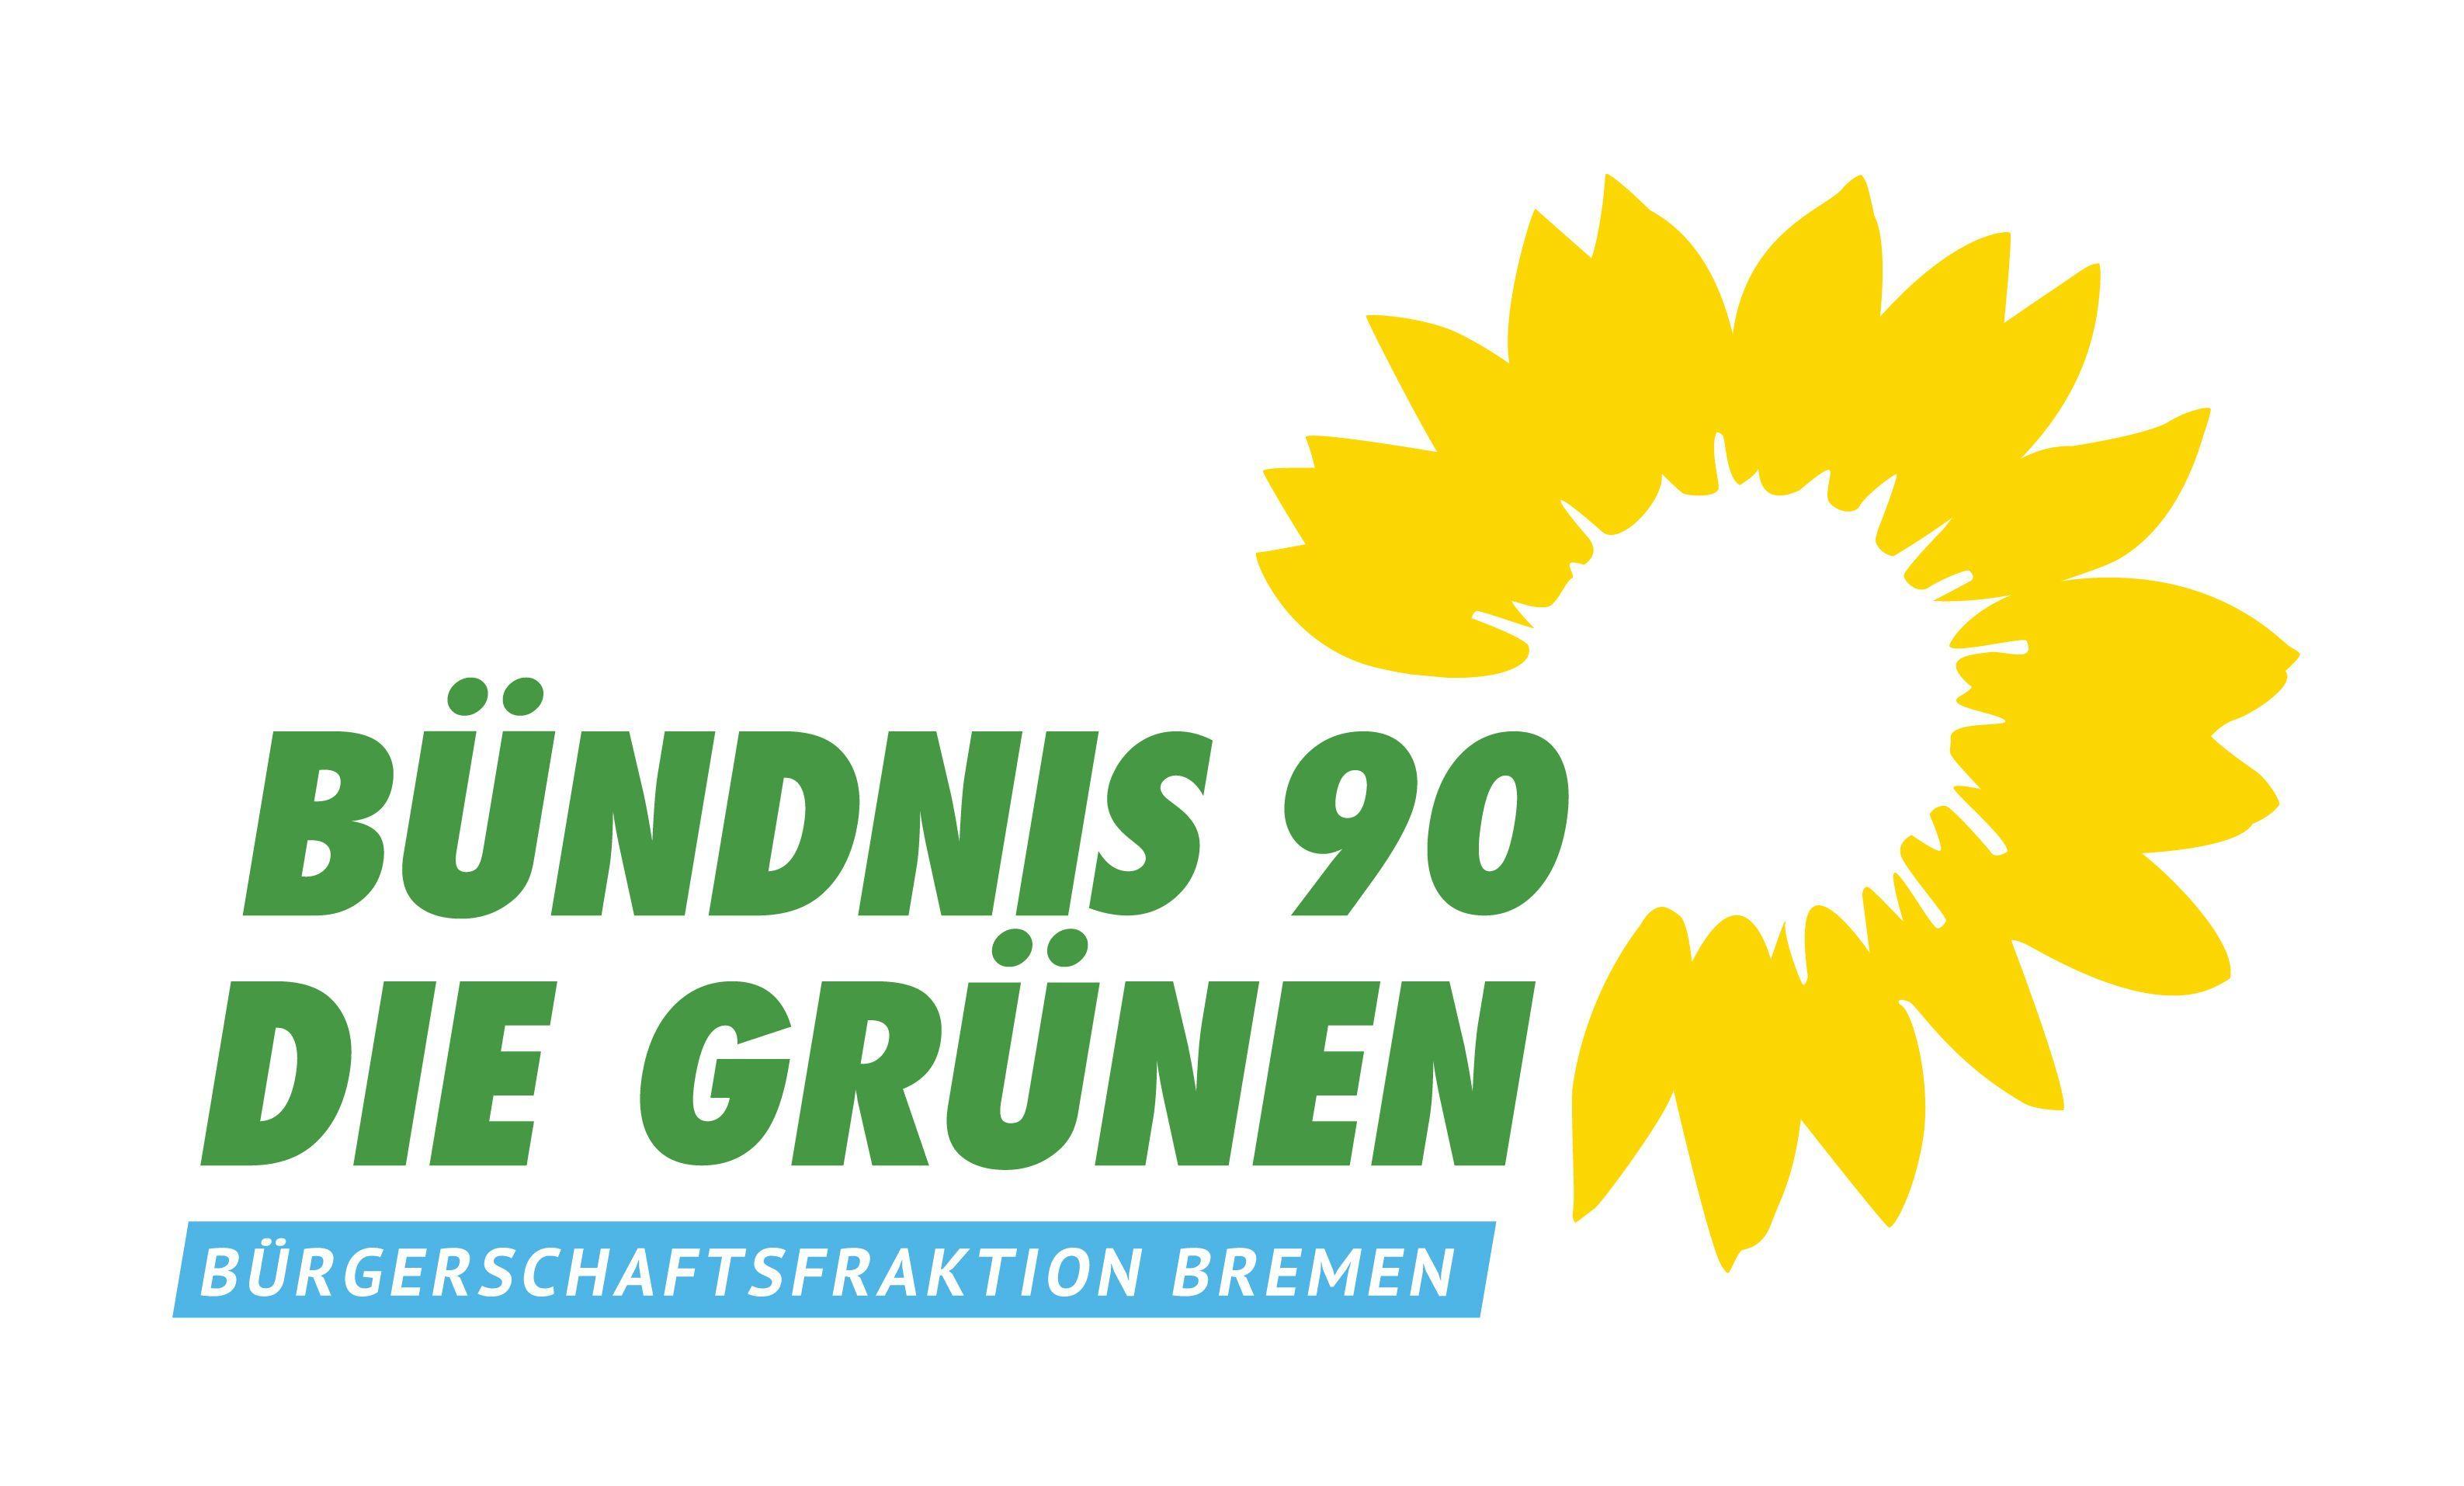 Bündnis 90 Die Grünen / Bürgerschaftsfraktion Bremen